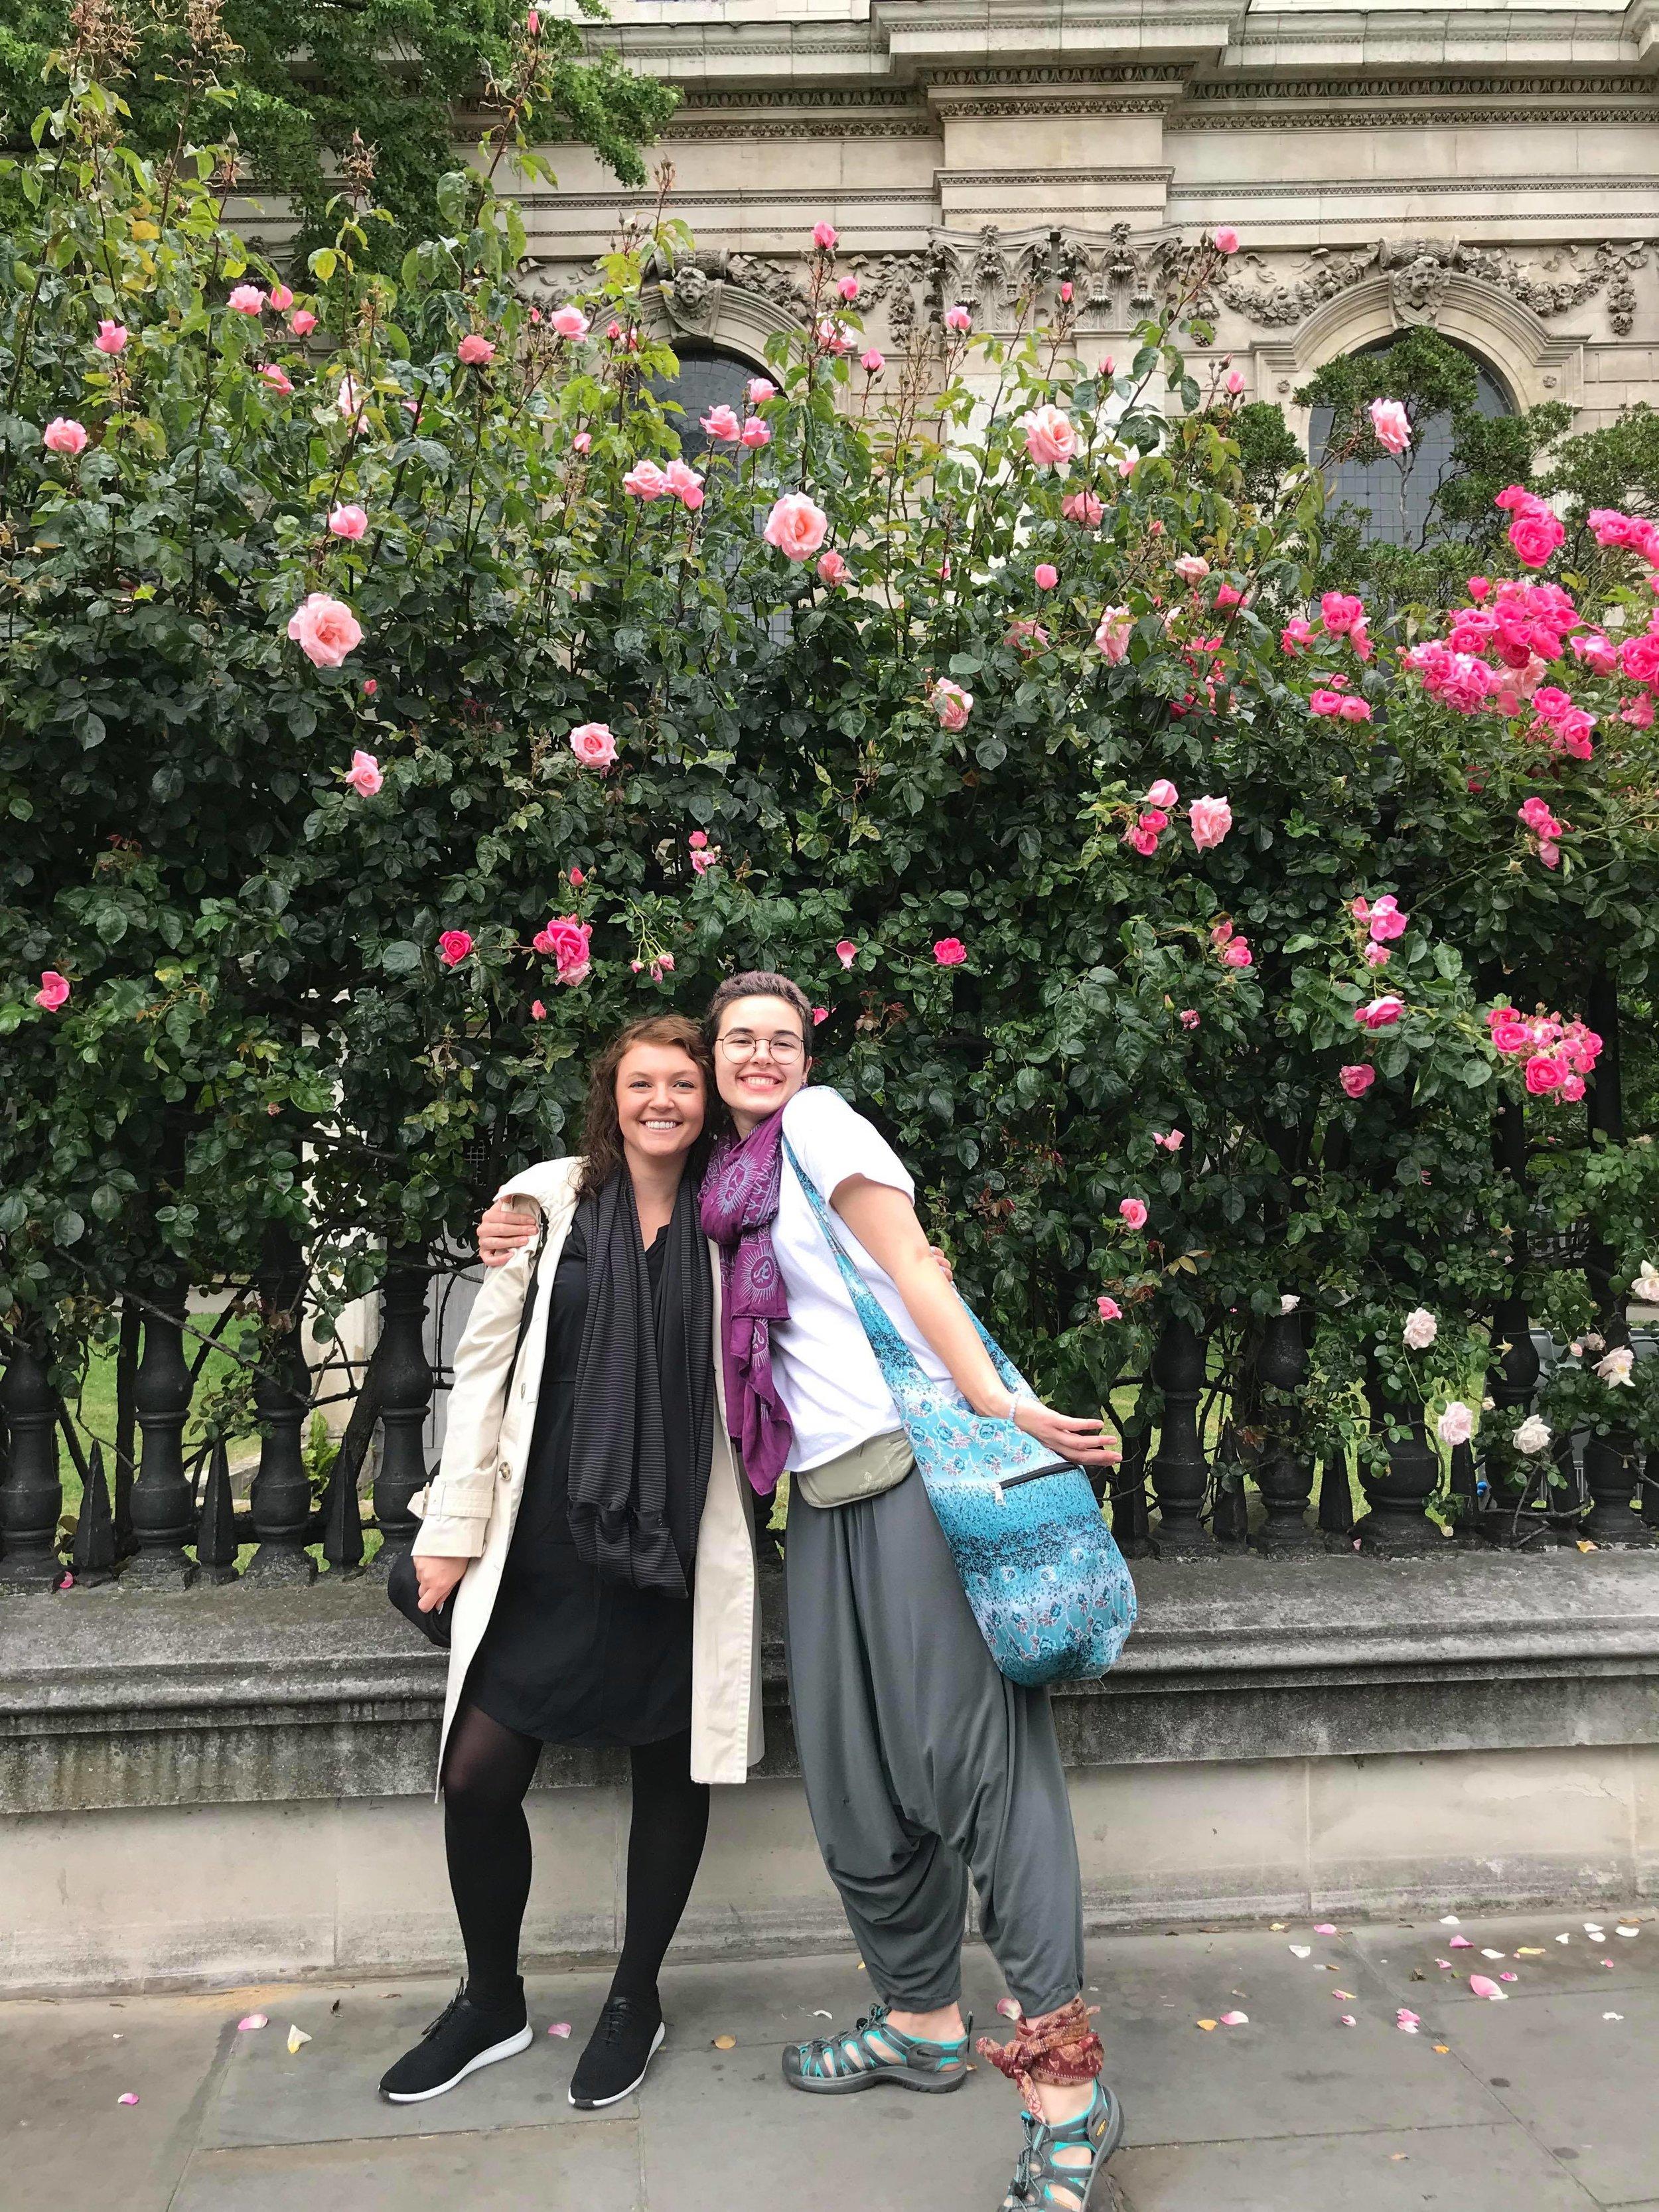 Alycia and Leah enjoying summer roses at St. Paul's